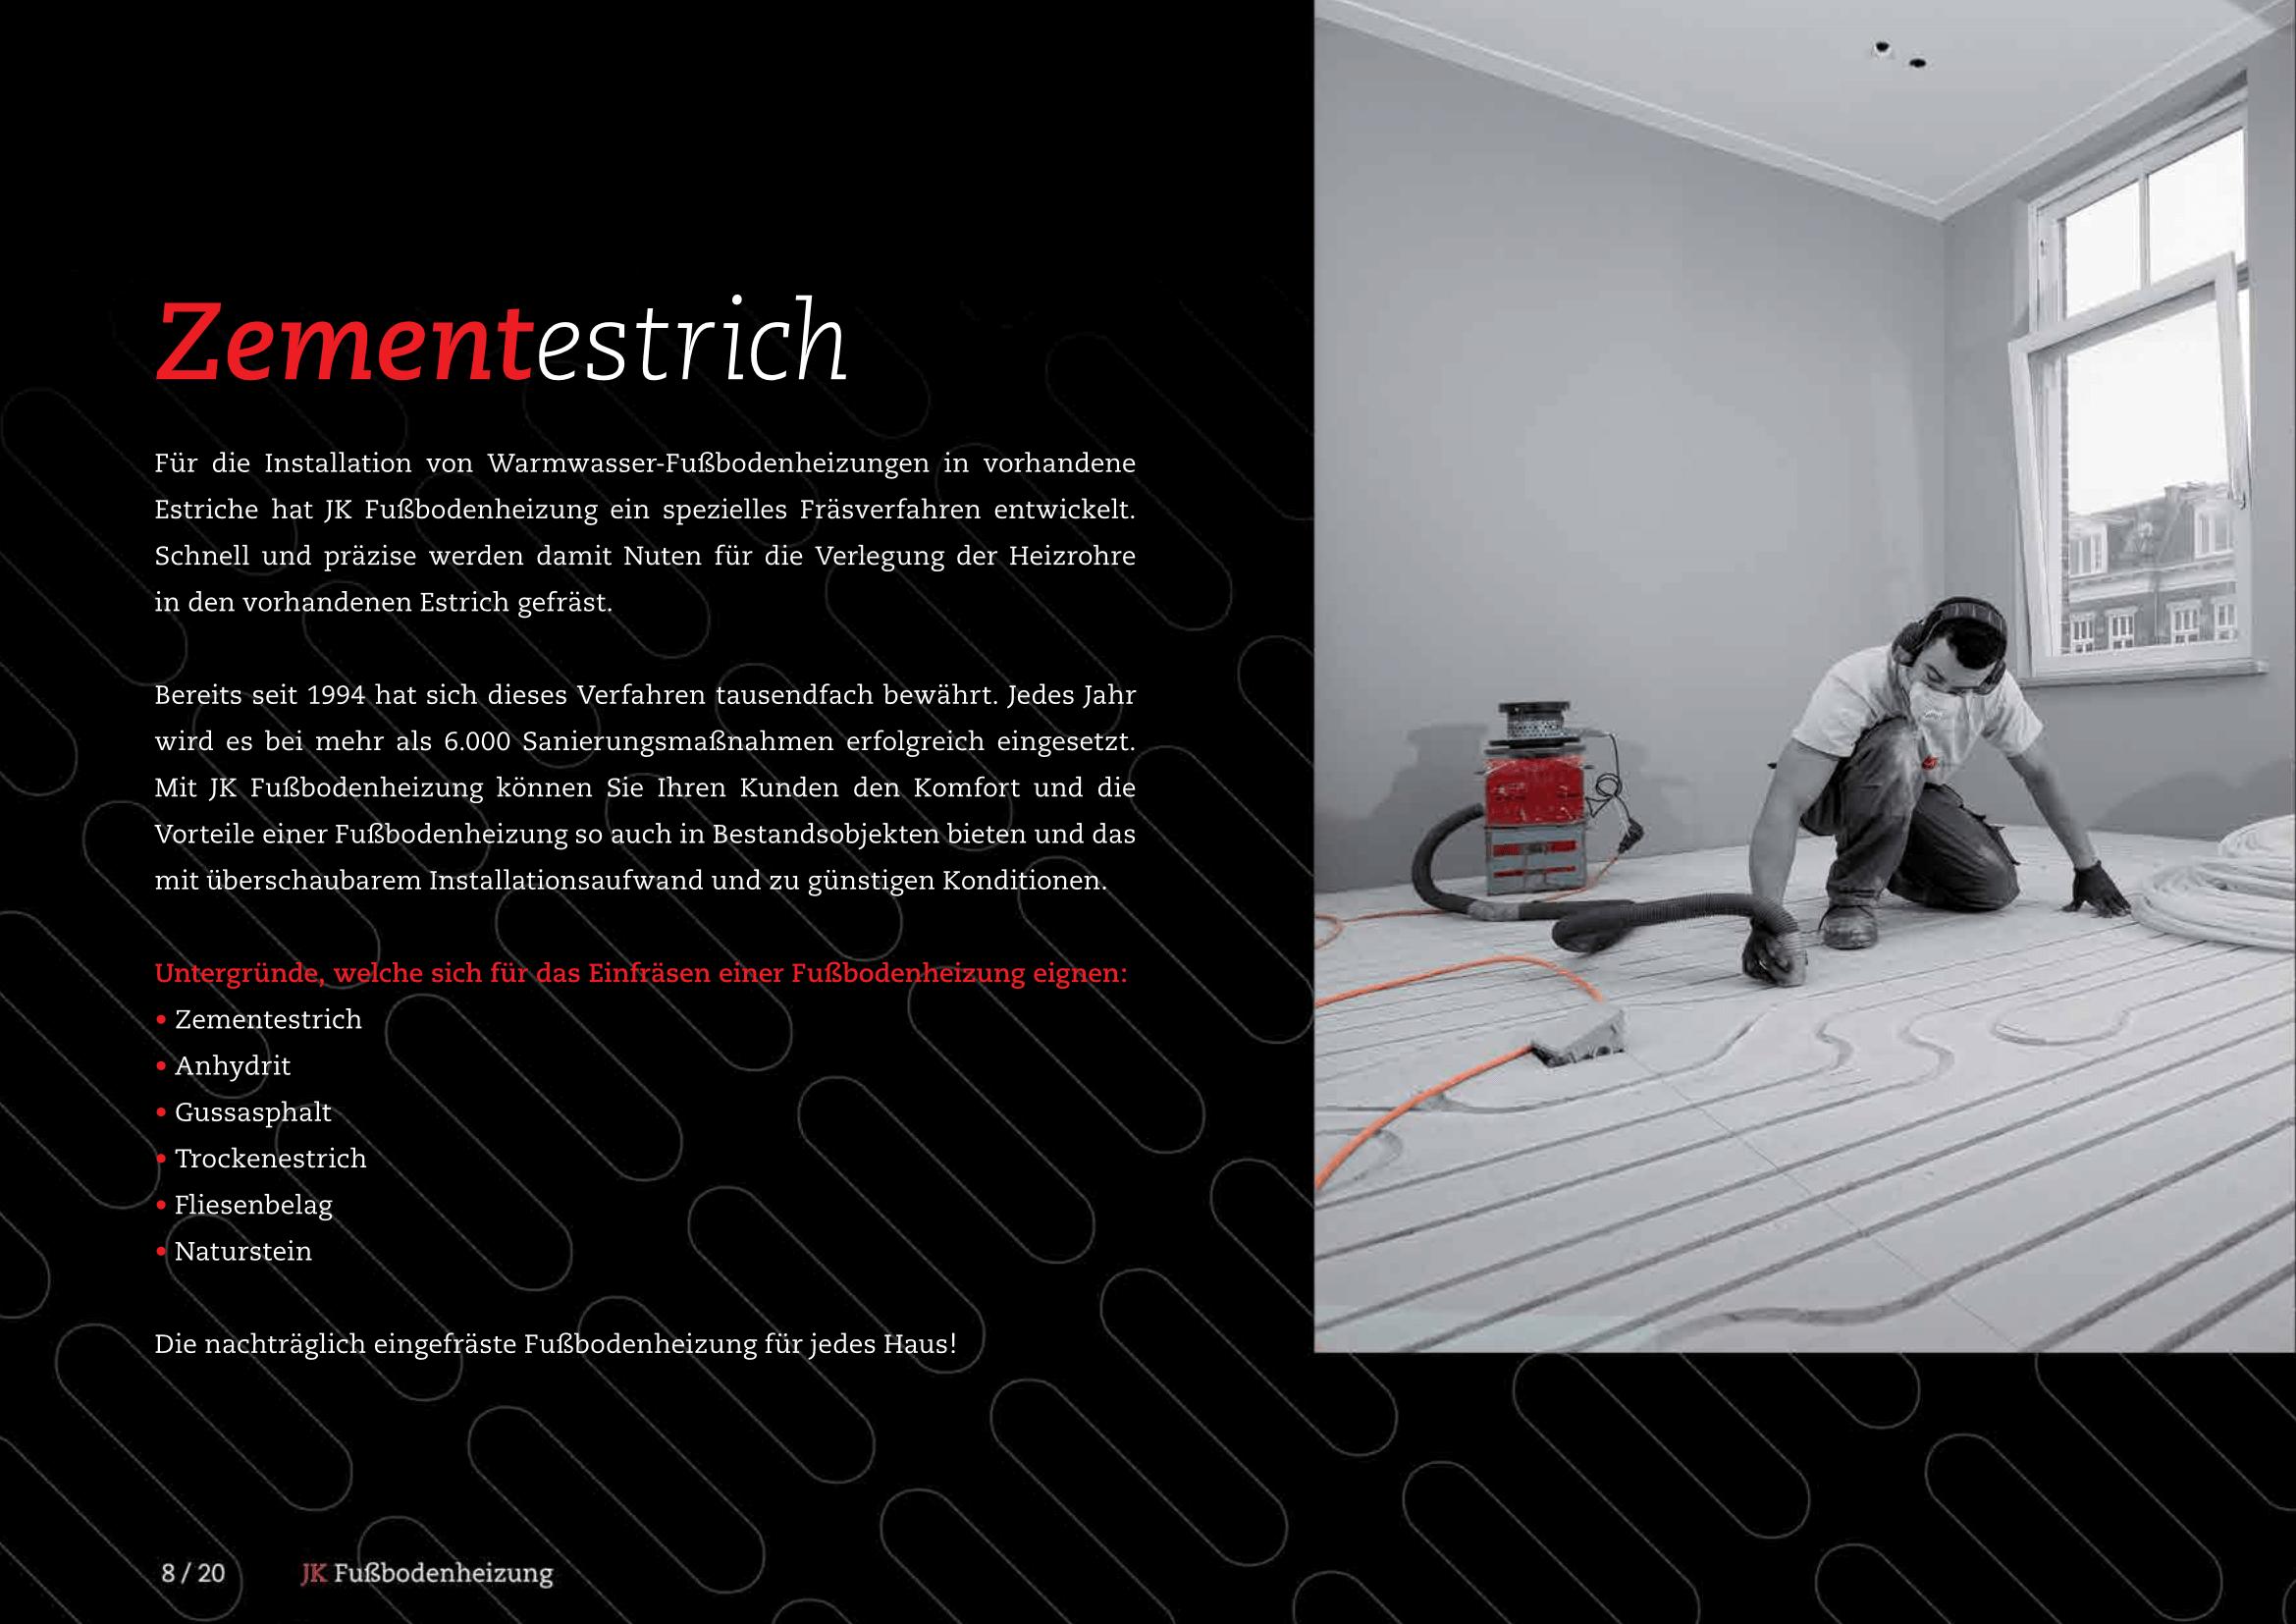 https://www.bonntech.de/wp-content/uploads/2018/02/JK-Beursbrochure-2016-Web_Page_8.png